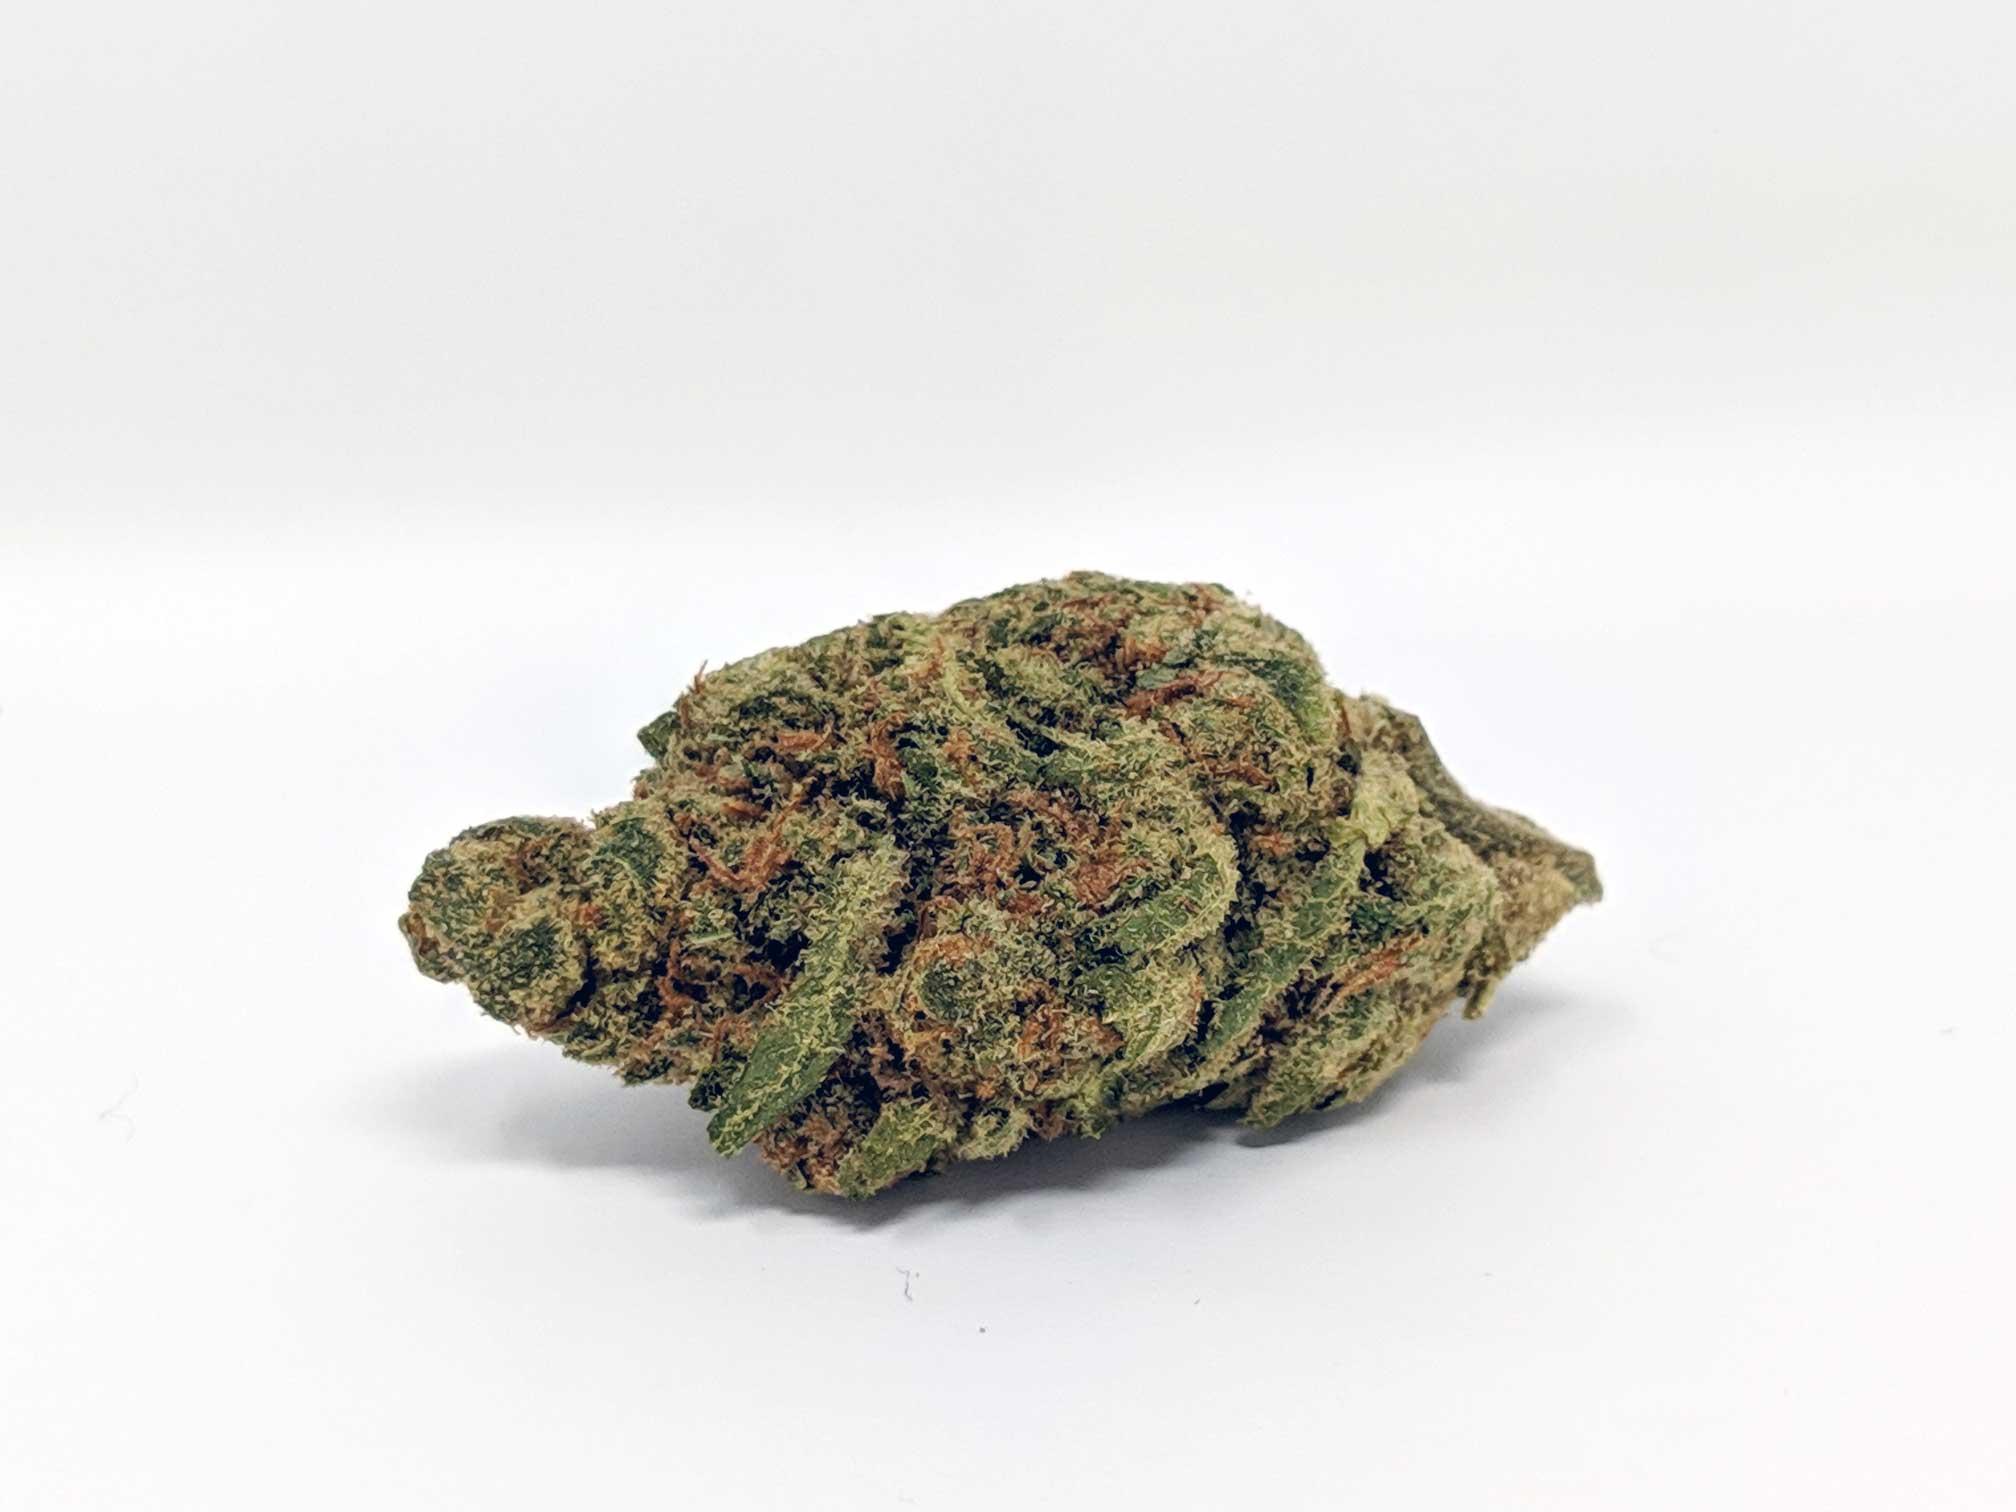 Fruit Bowl, Fruit Bowl by Karma Genetics – Cannabis Strain Review & Information